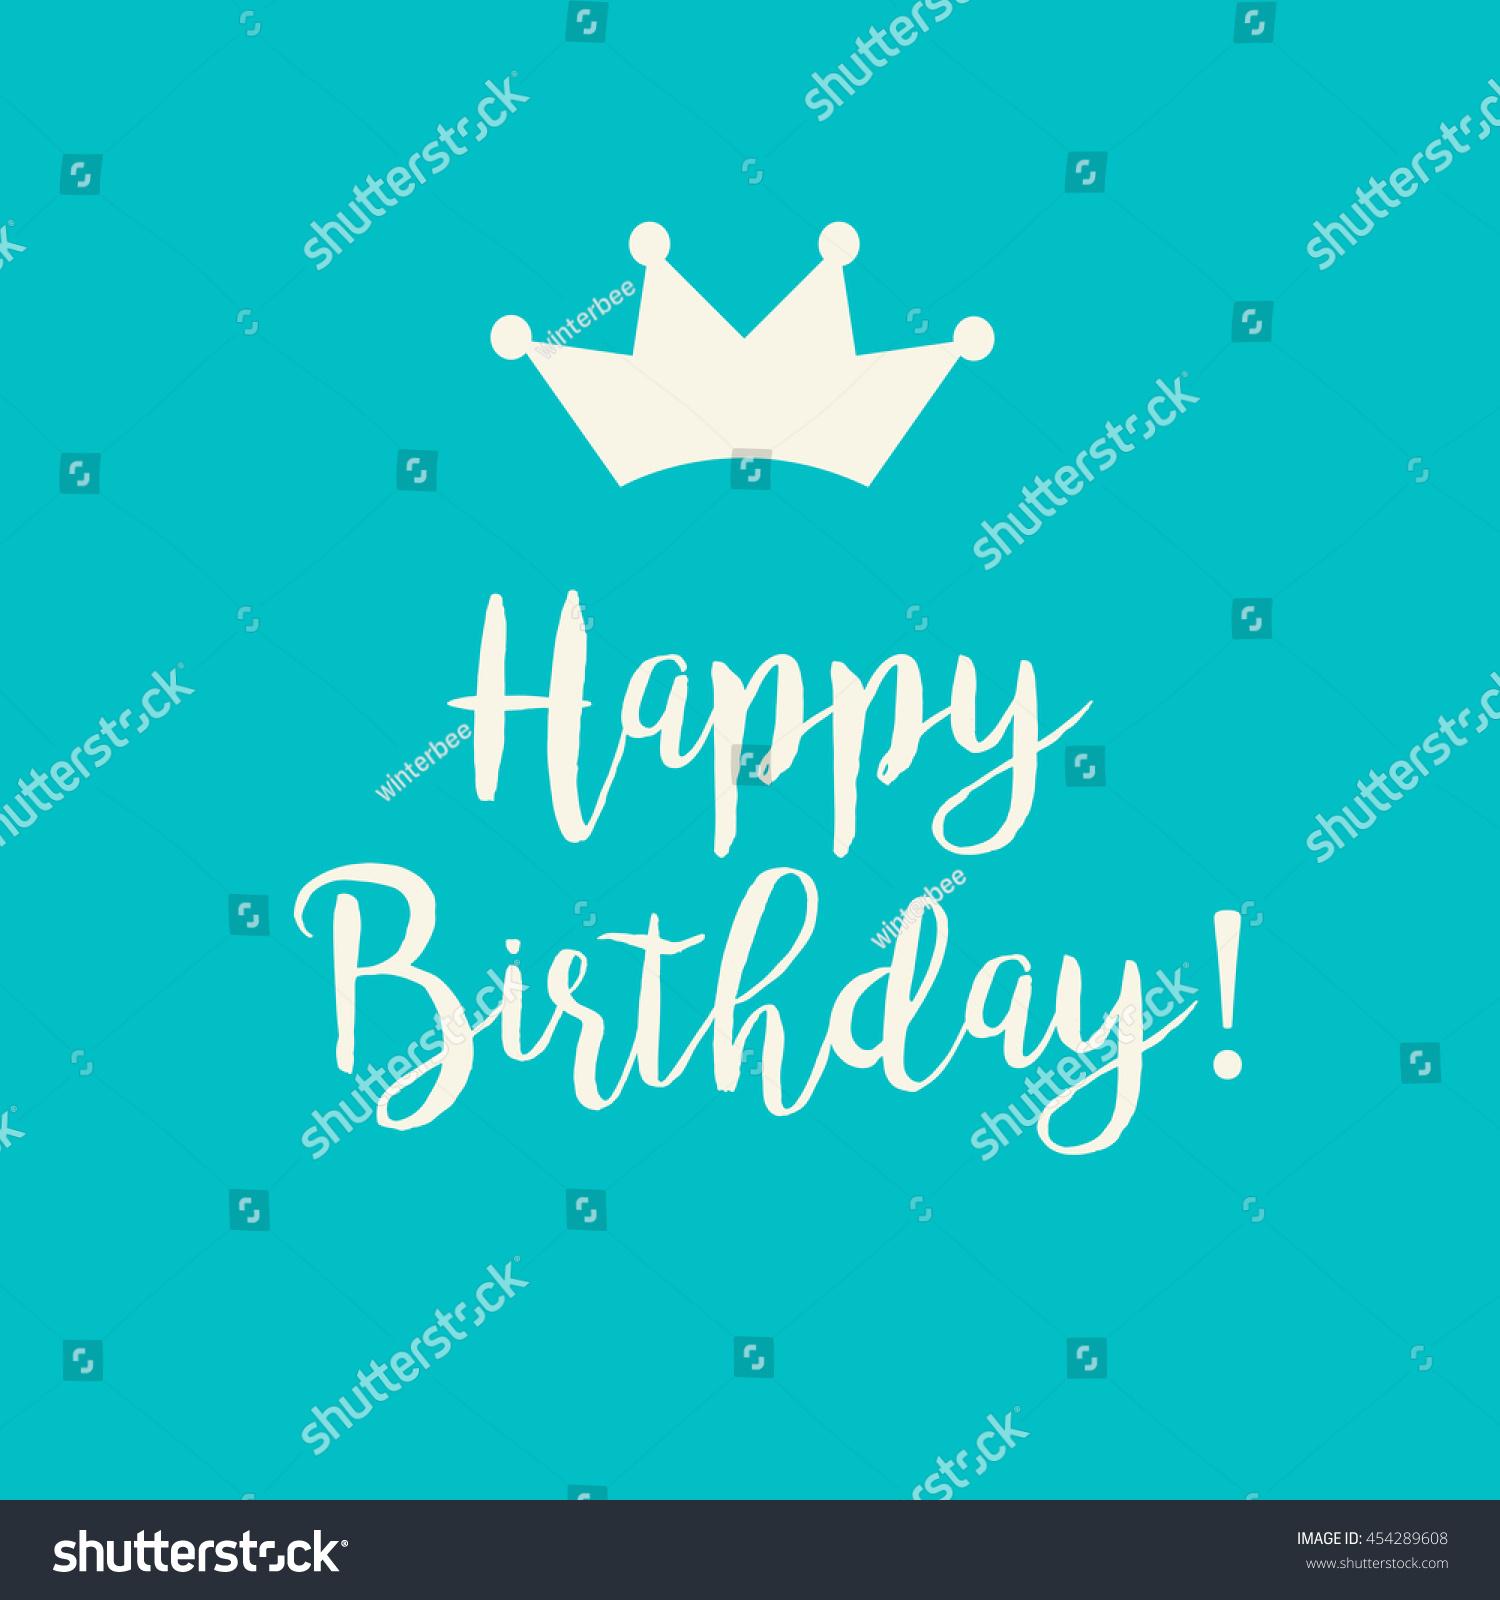 Cute Happy Birthday Card Handwritten Text Stock